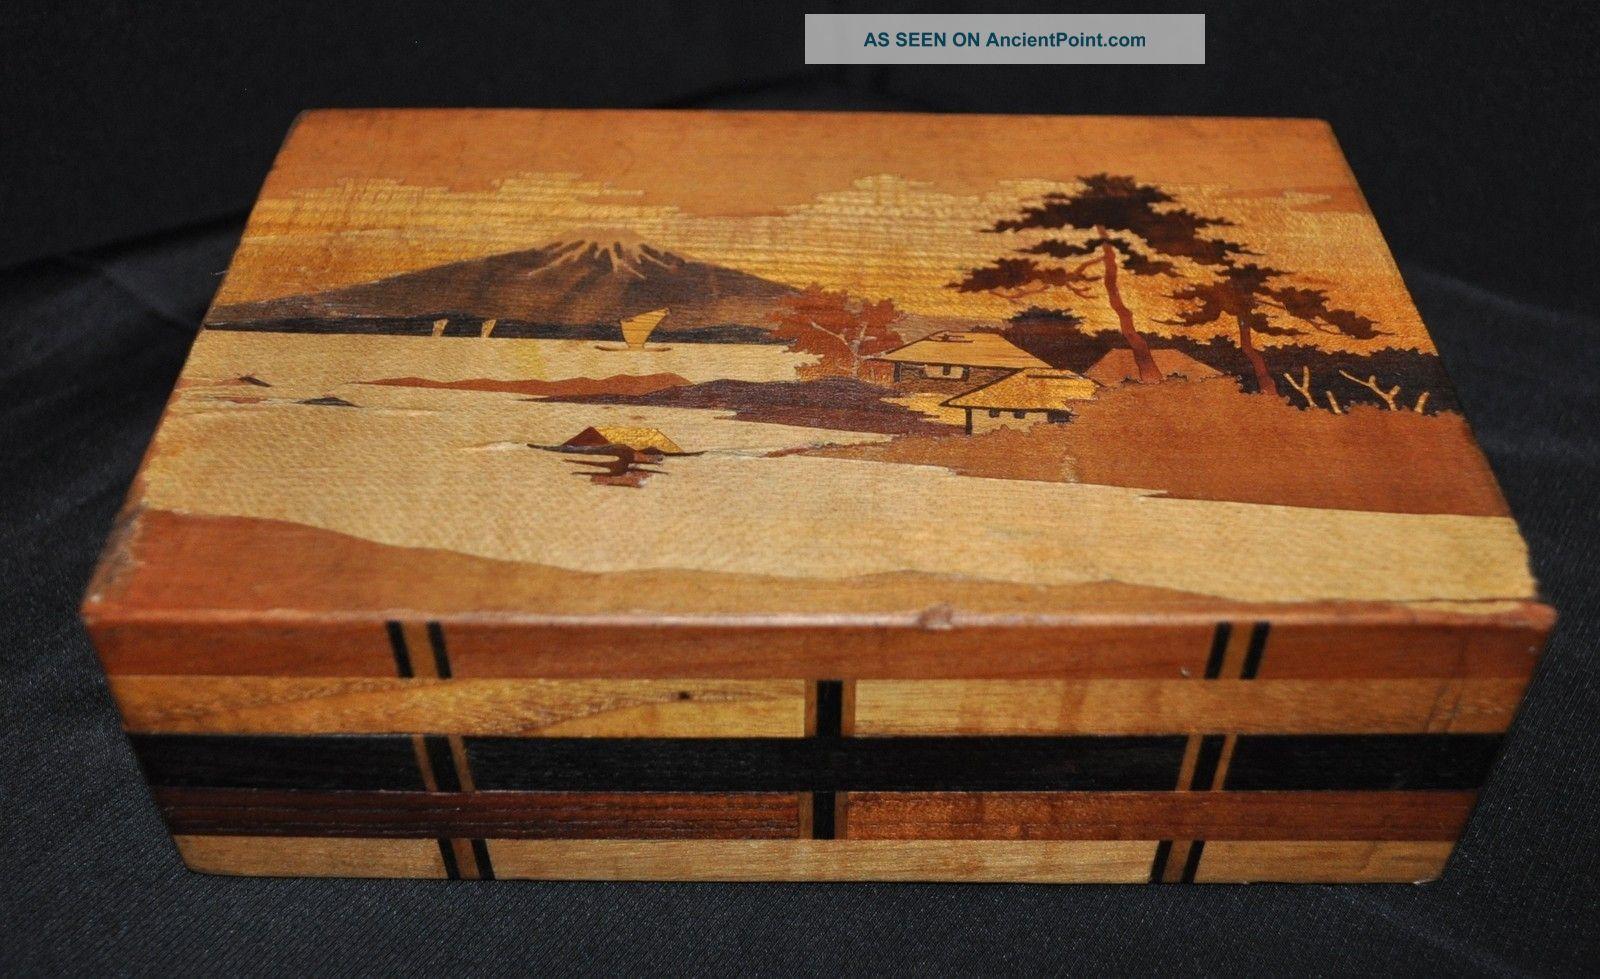 Unique Vintage Asian Box Wood Box With Secret Opening Box 7 X 4 1 2 X 2 1 4